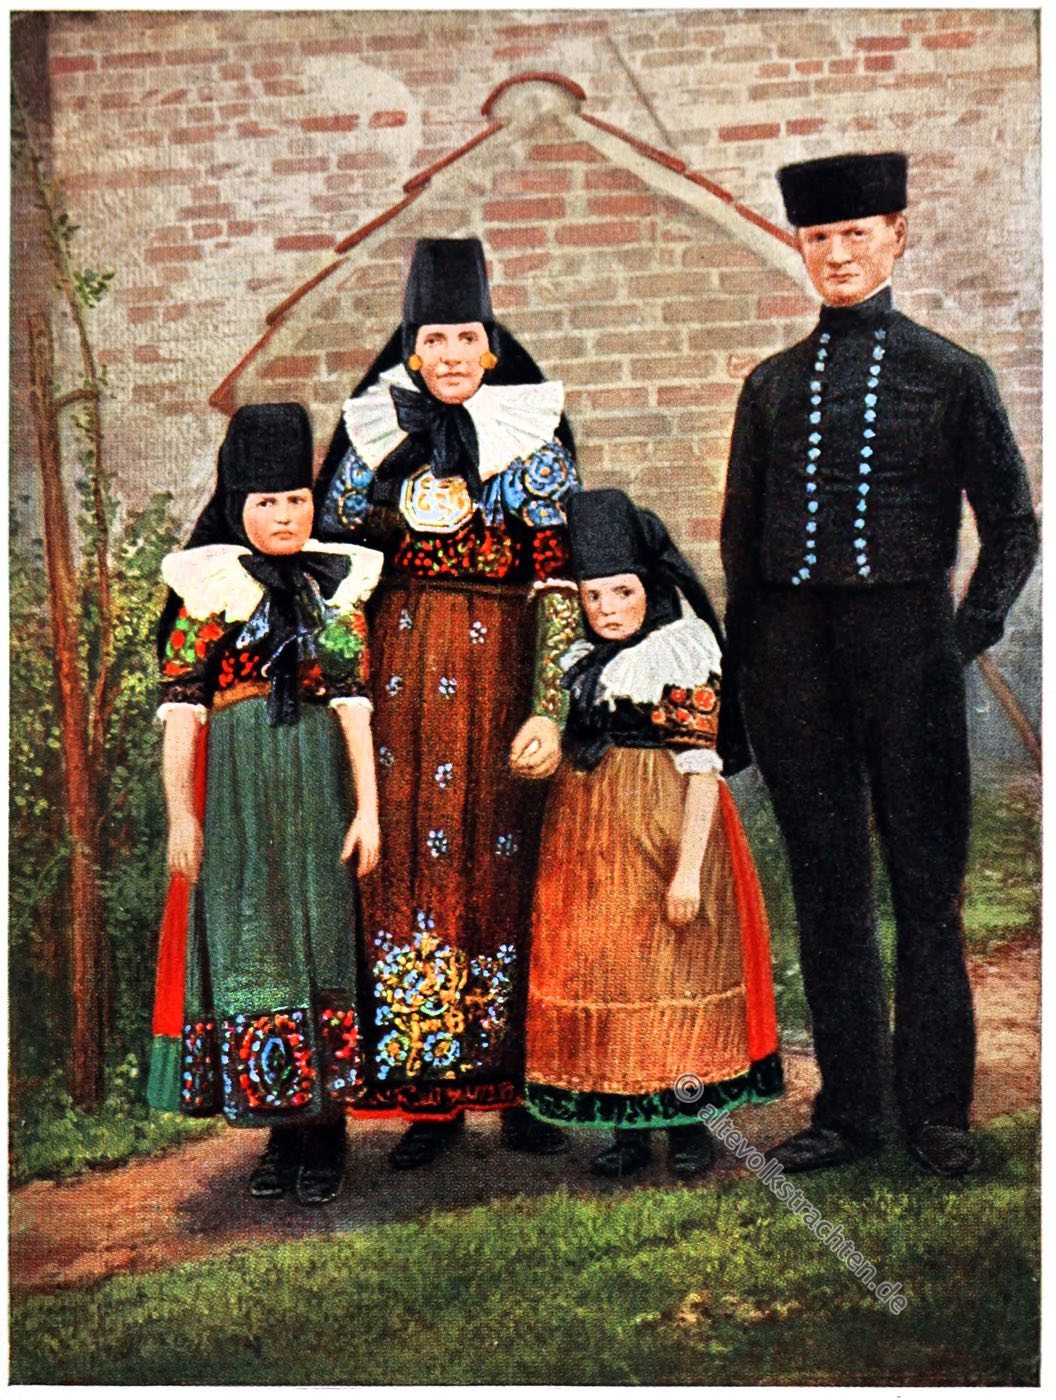 Trachten, Niedersachsen, Schaumburg-Lippe, Lindhorst, Rose Julien, Deutsche Volkstrachten